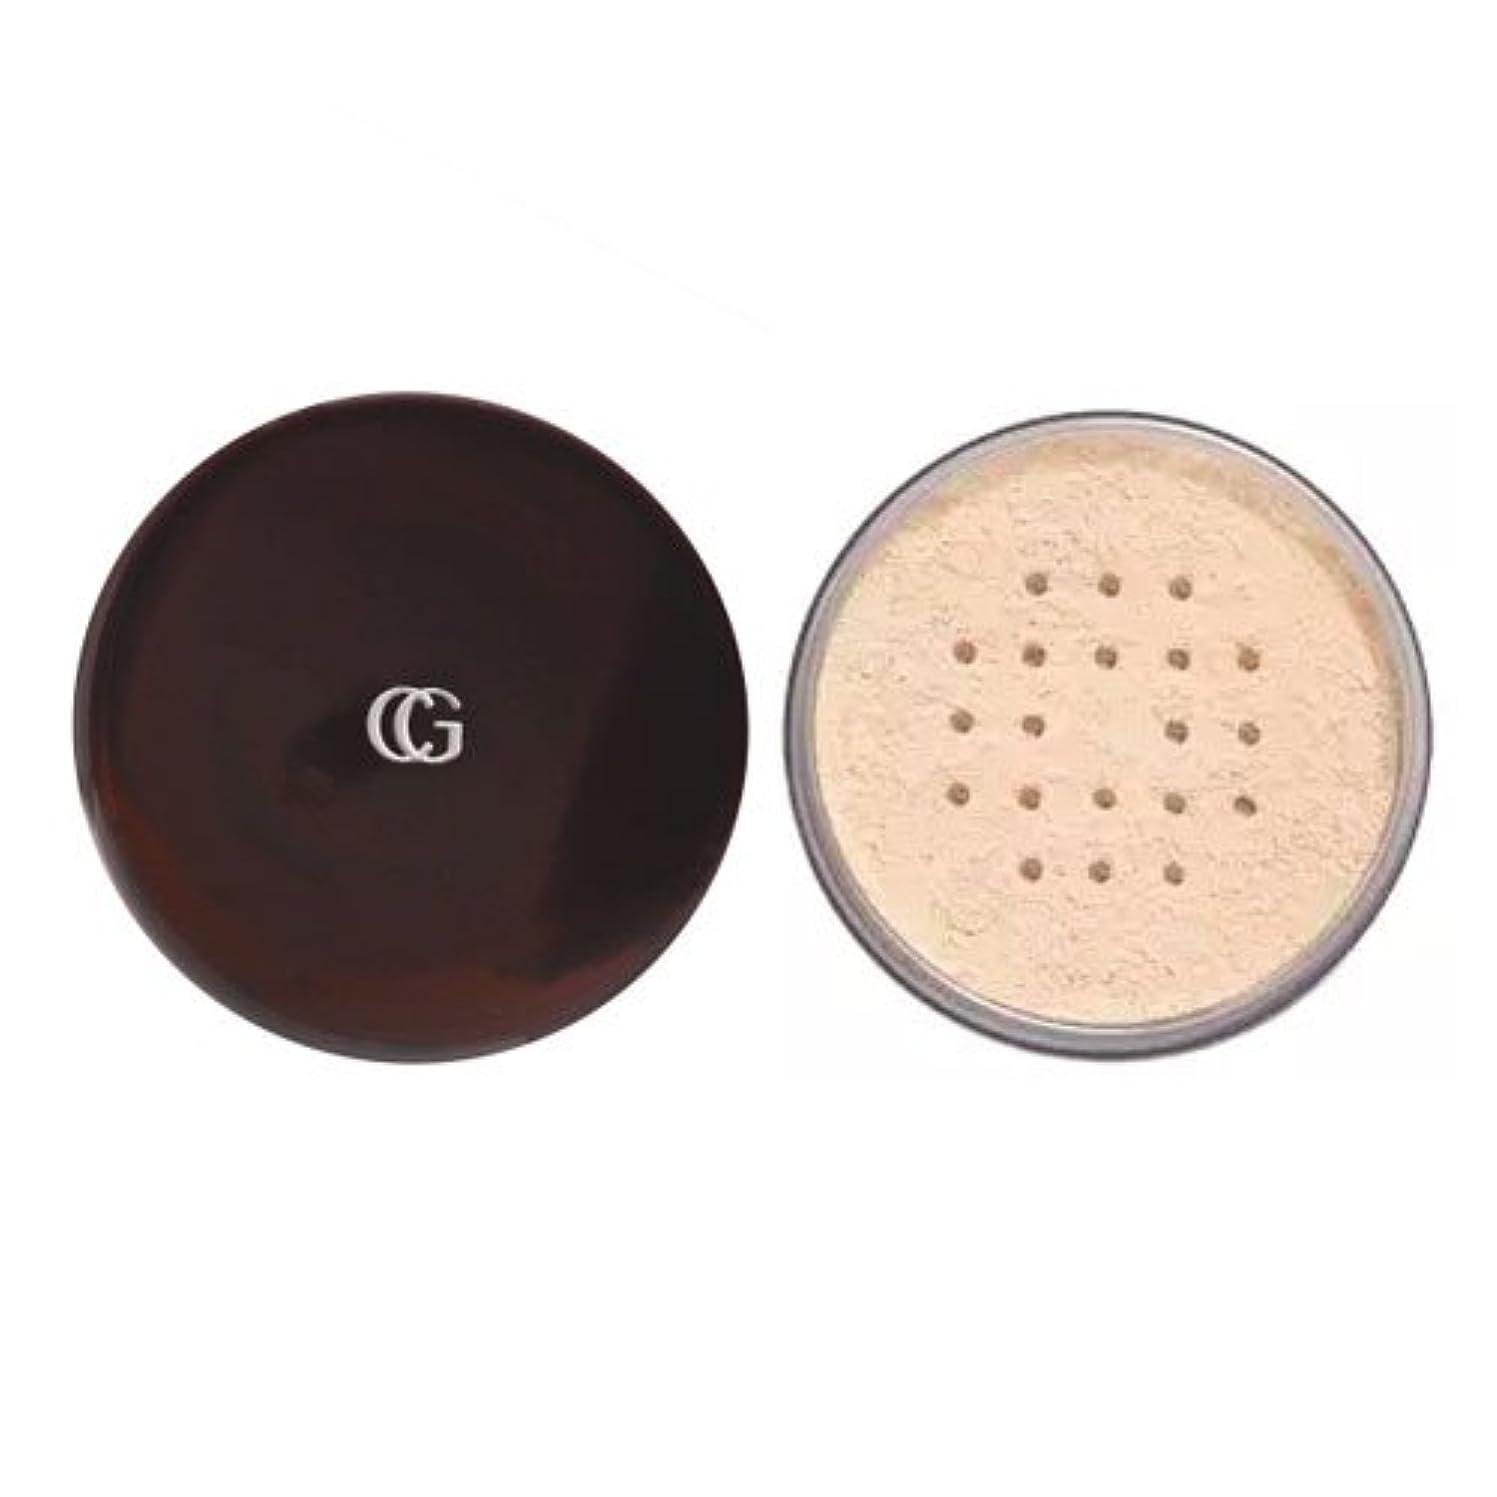 (3 Pack) COVERGIRL Professional Loose Powder - Translucent Fair 105 (並行輸入品)